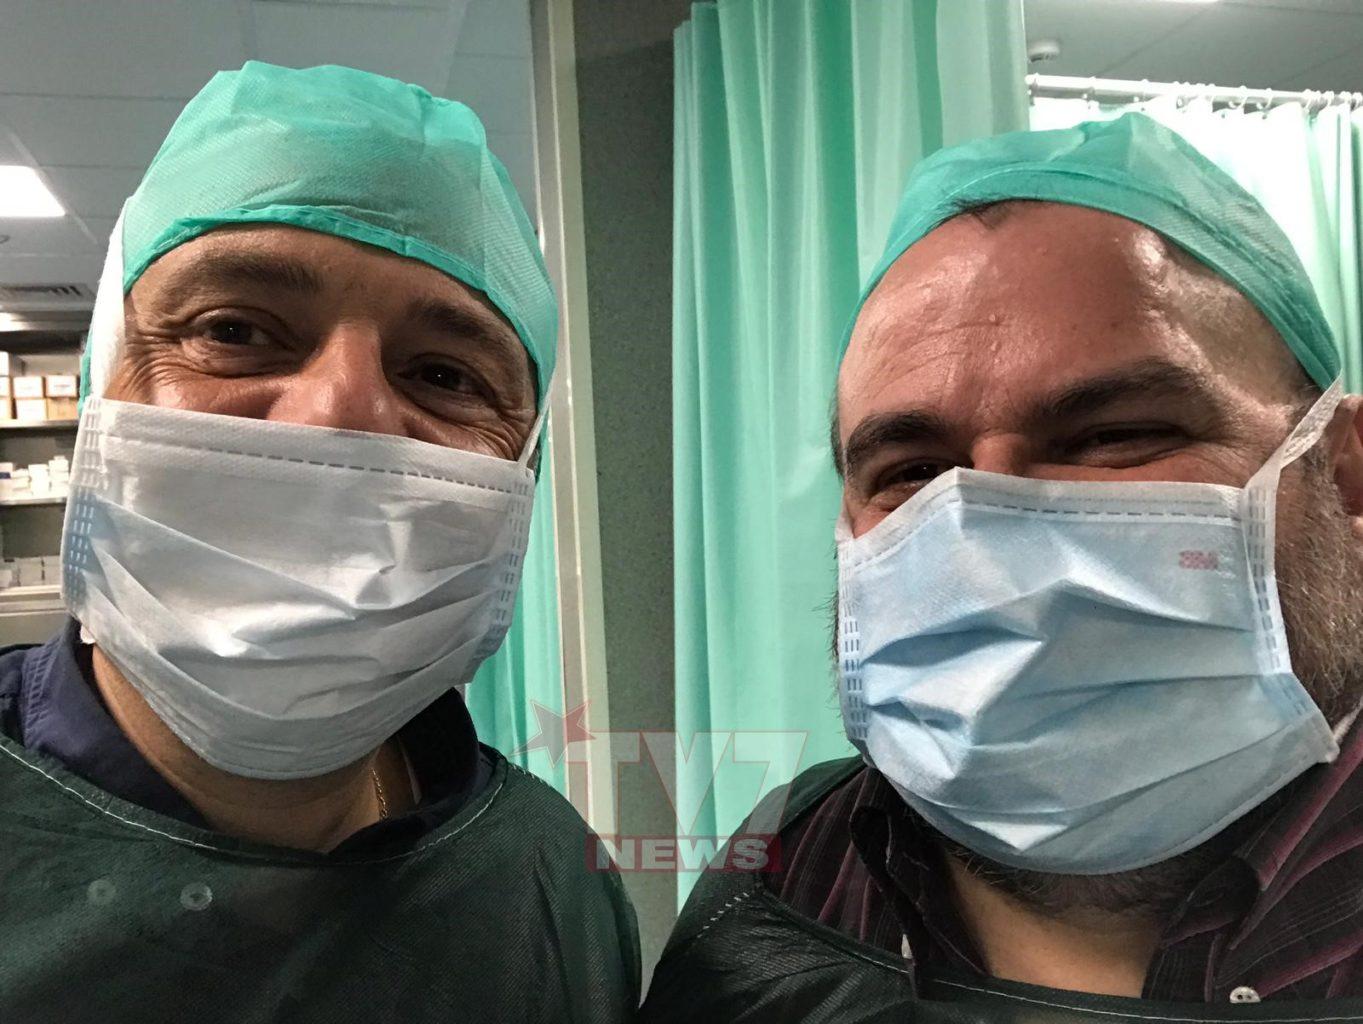 laser verde prostata fatebenefratelli napoli